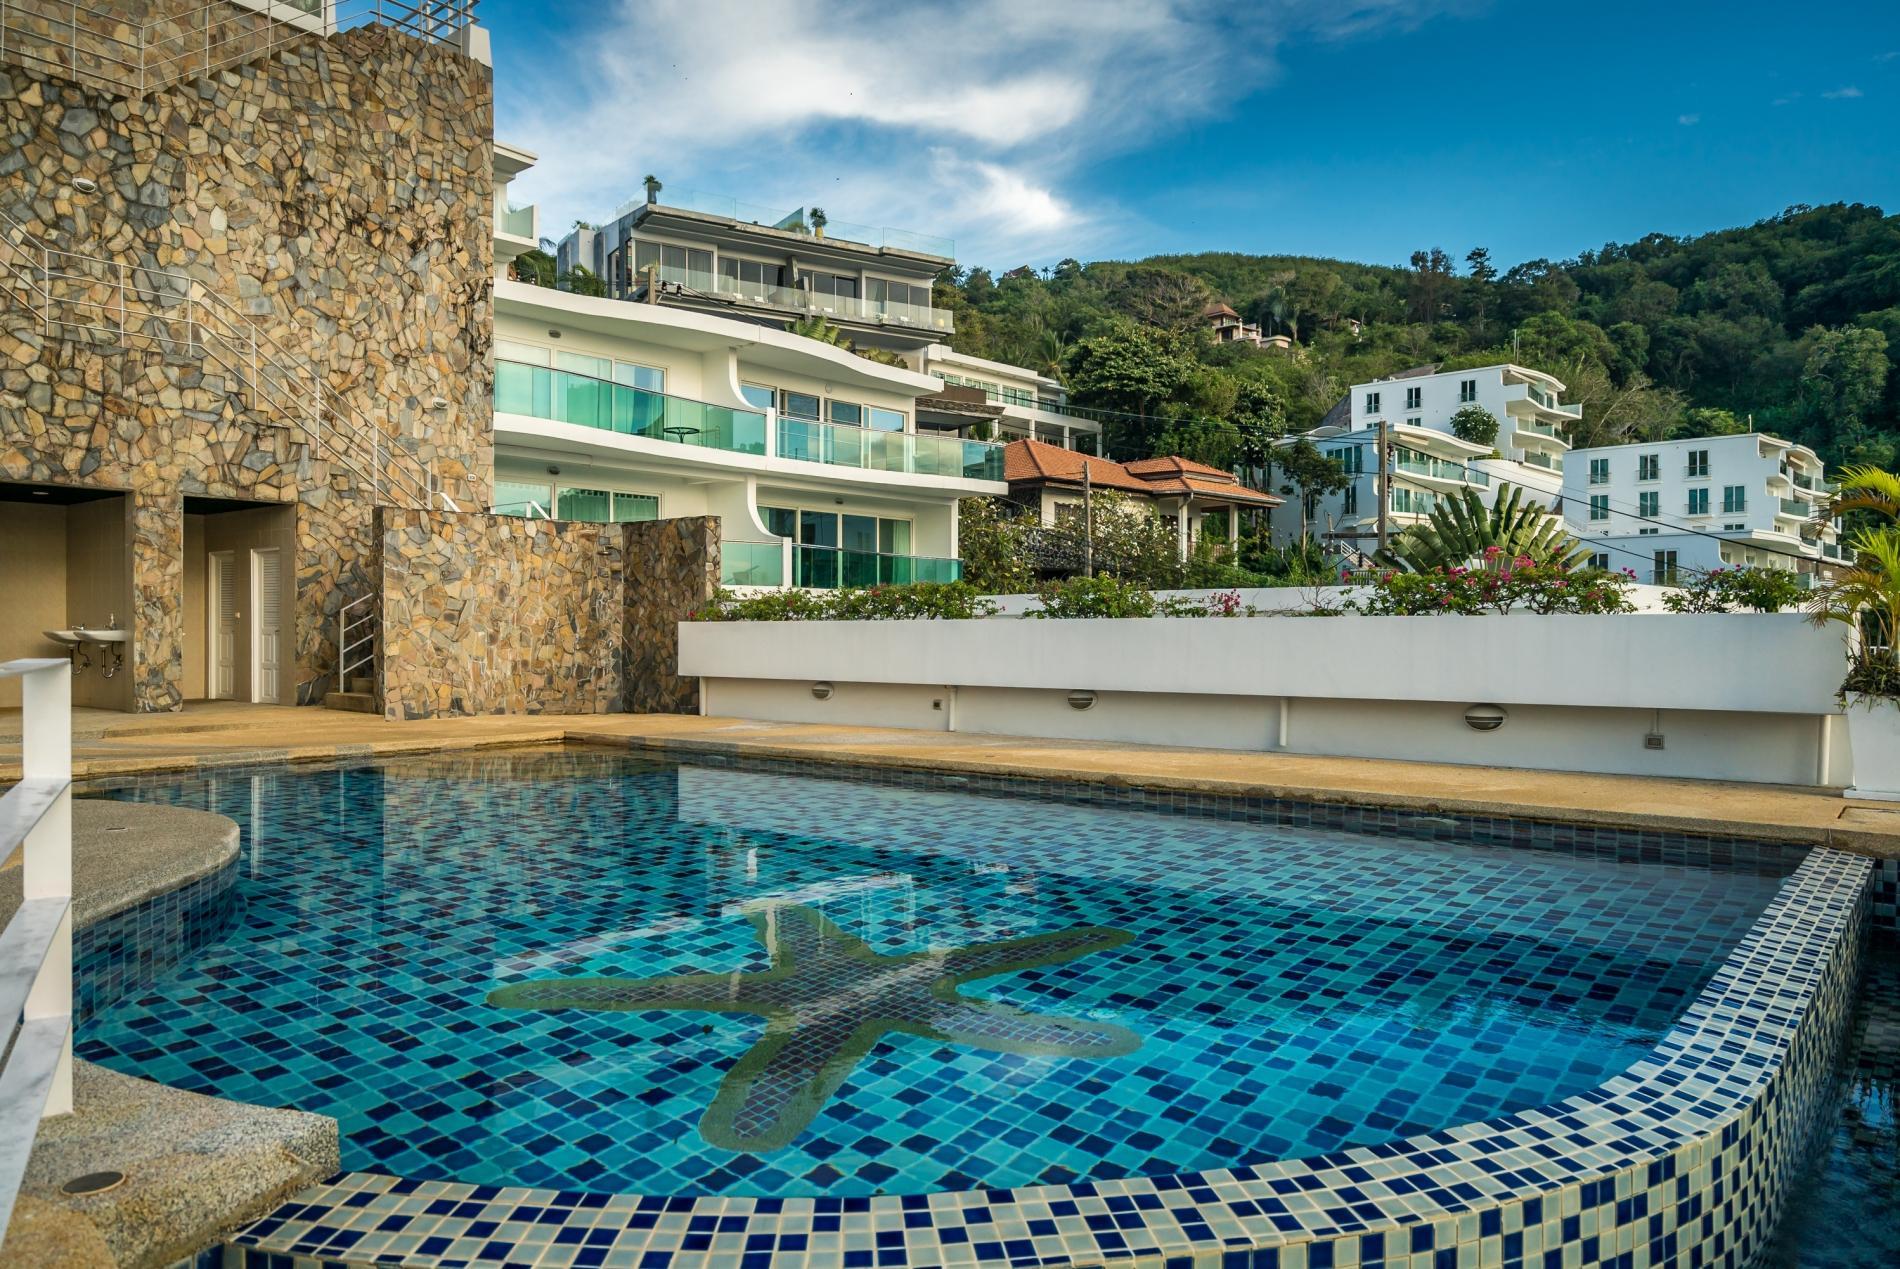 Apartment Kata Ocean View condominium - 1 bdr mountain view apartment photo 20321133